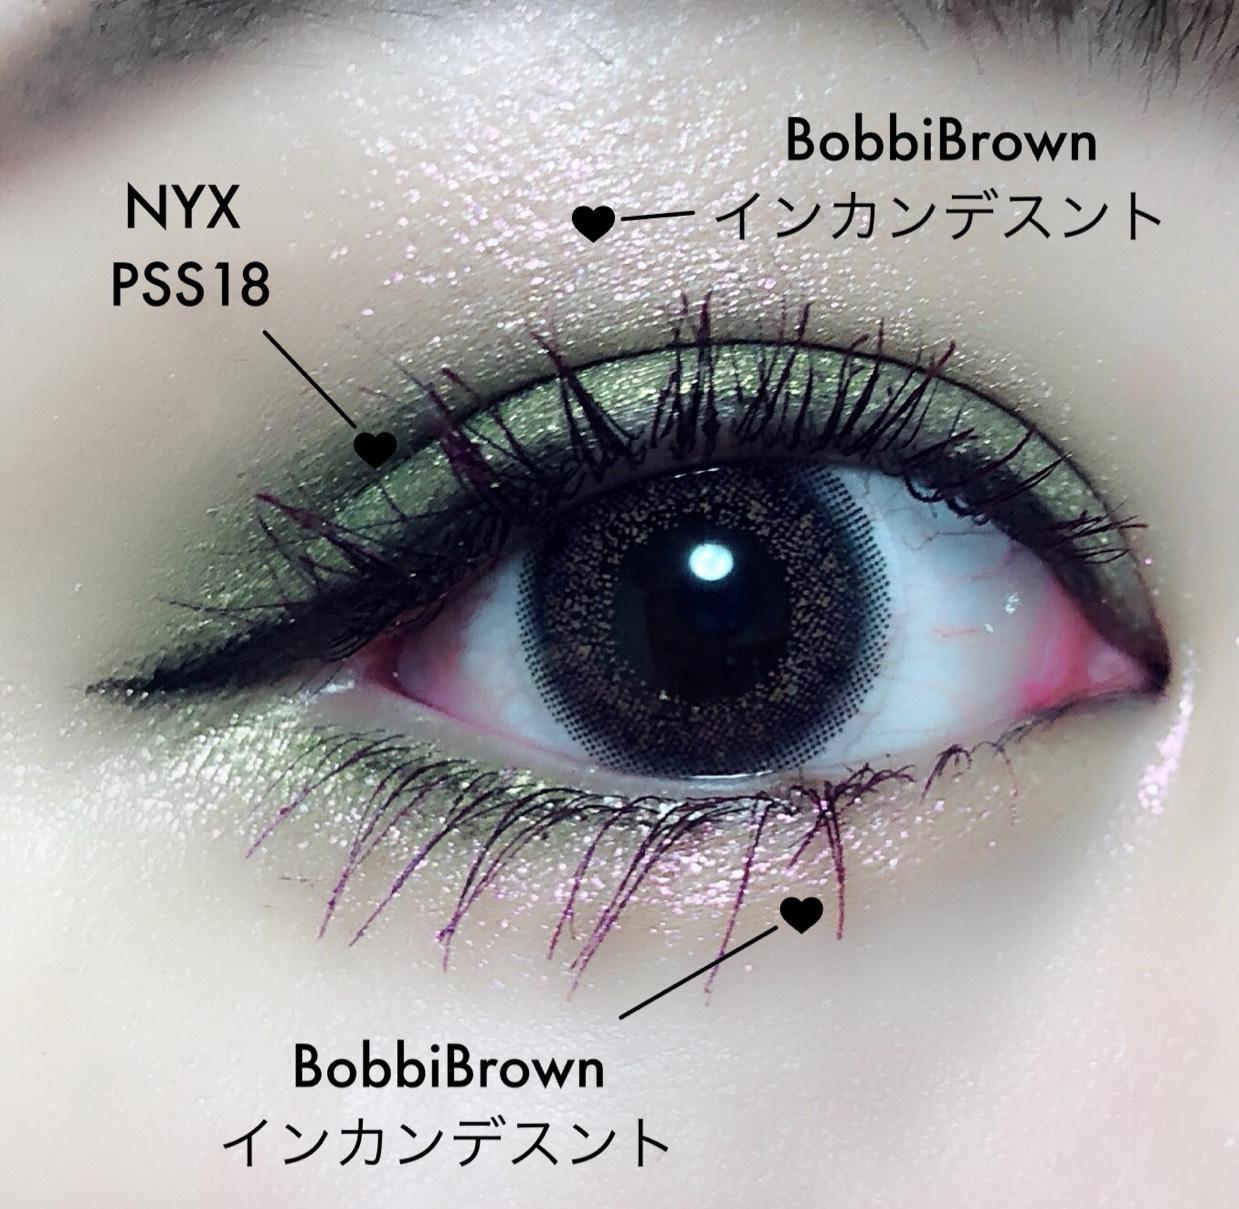 NYX ×bobbibrown 指塗りメイク